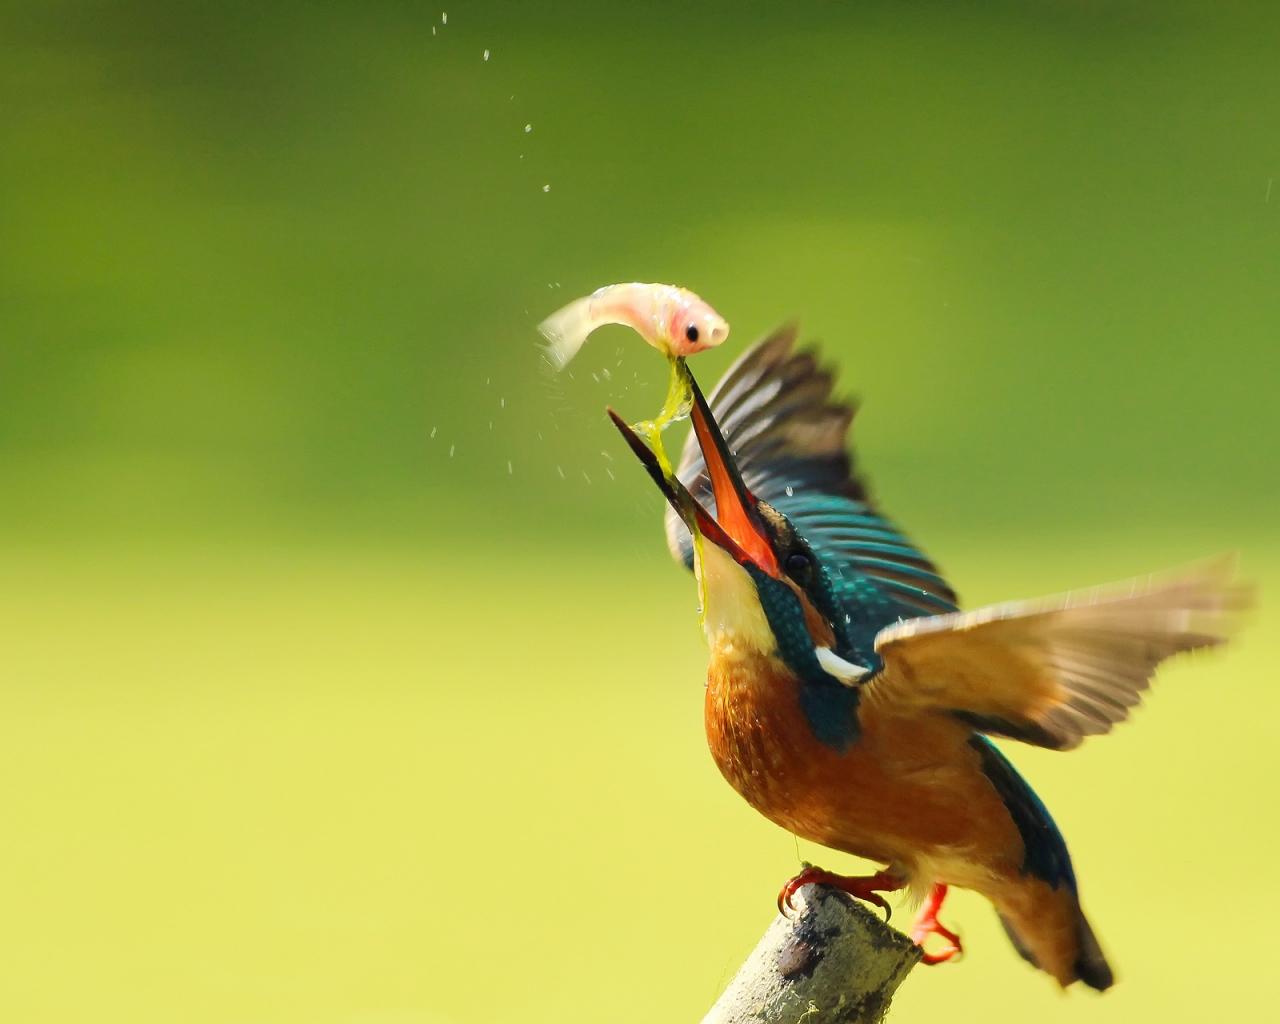 Pájaro pescando - 1280x1024